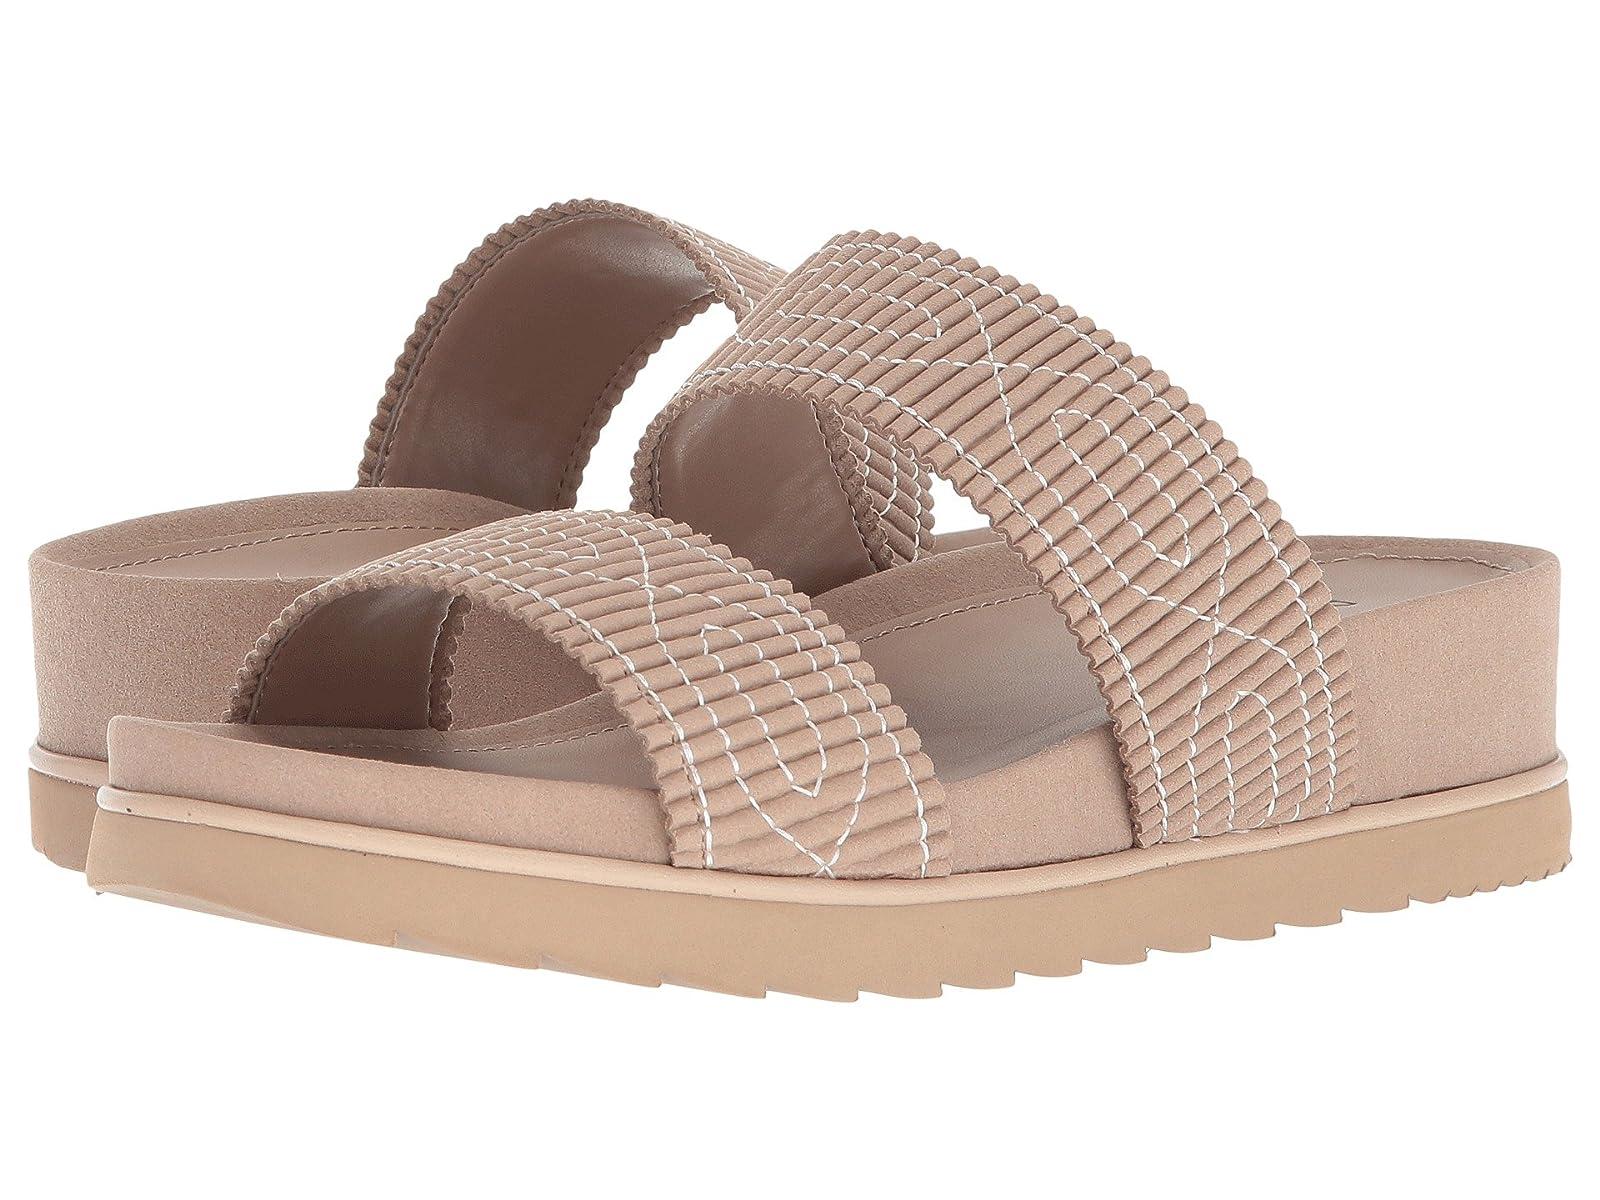 Donald J Pliner CaitCheap and distinctive eye-catching shoes